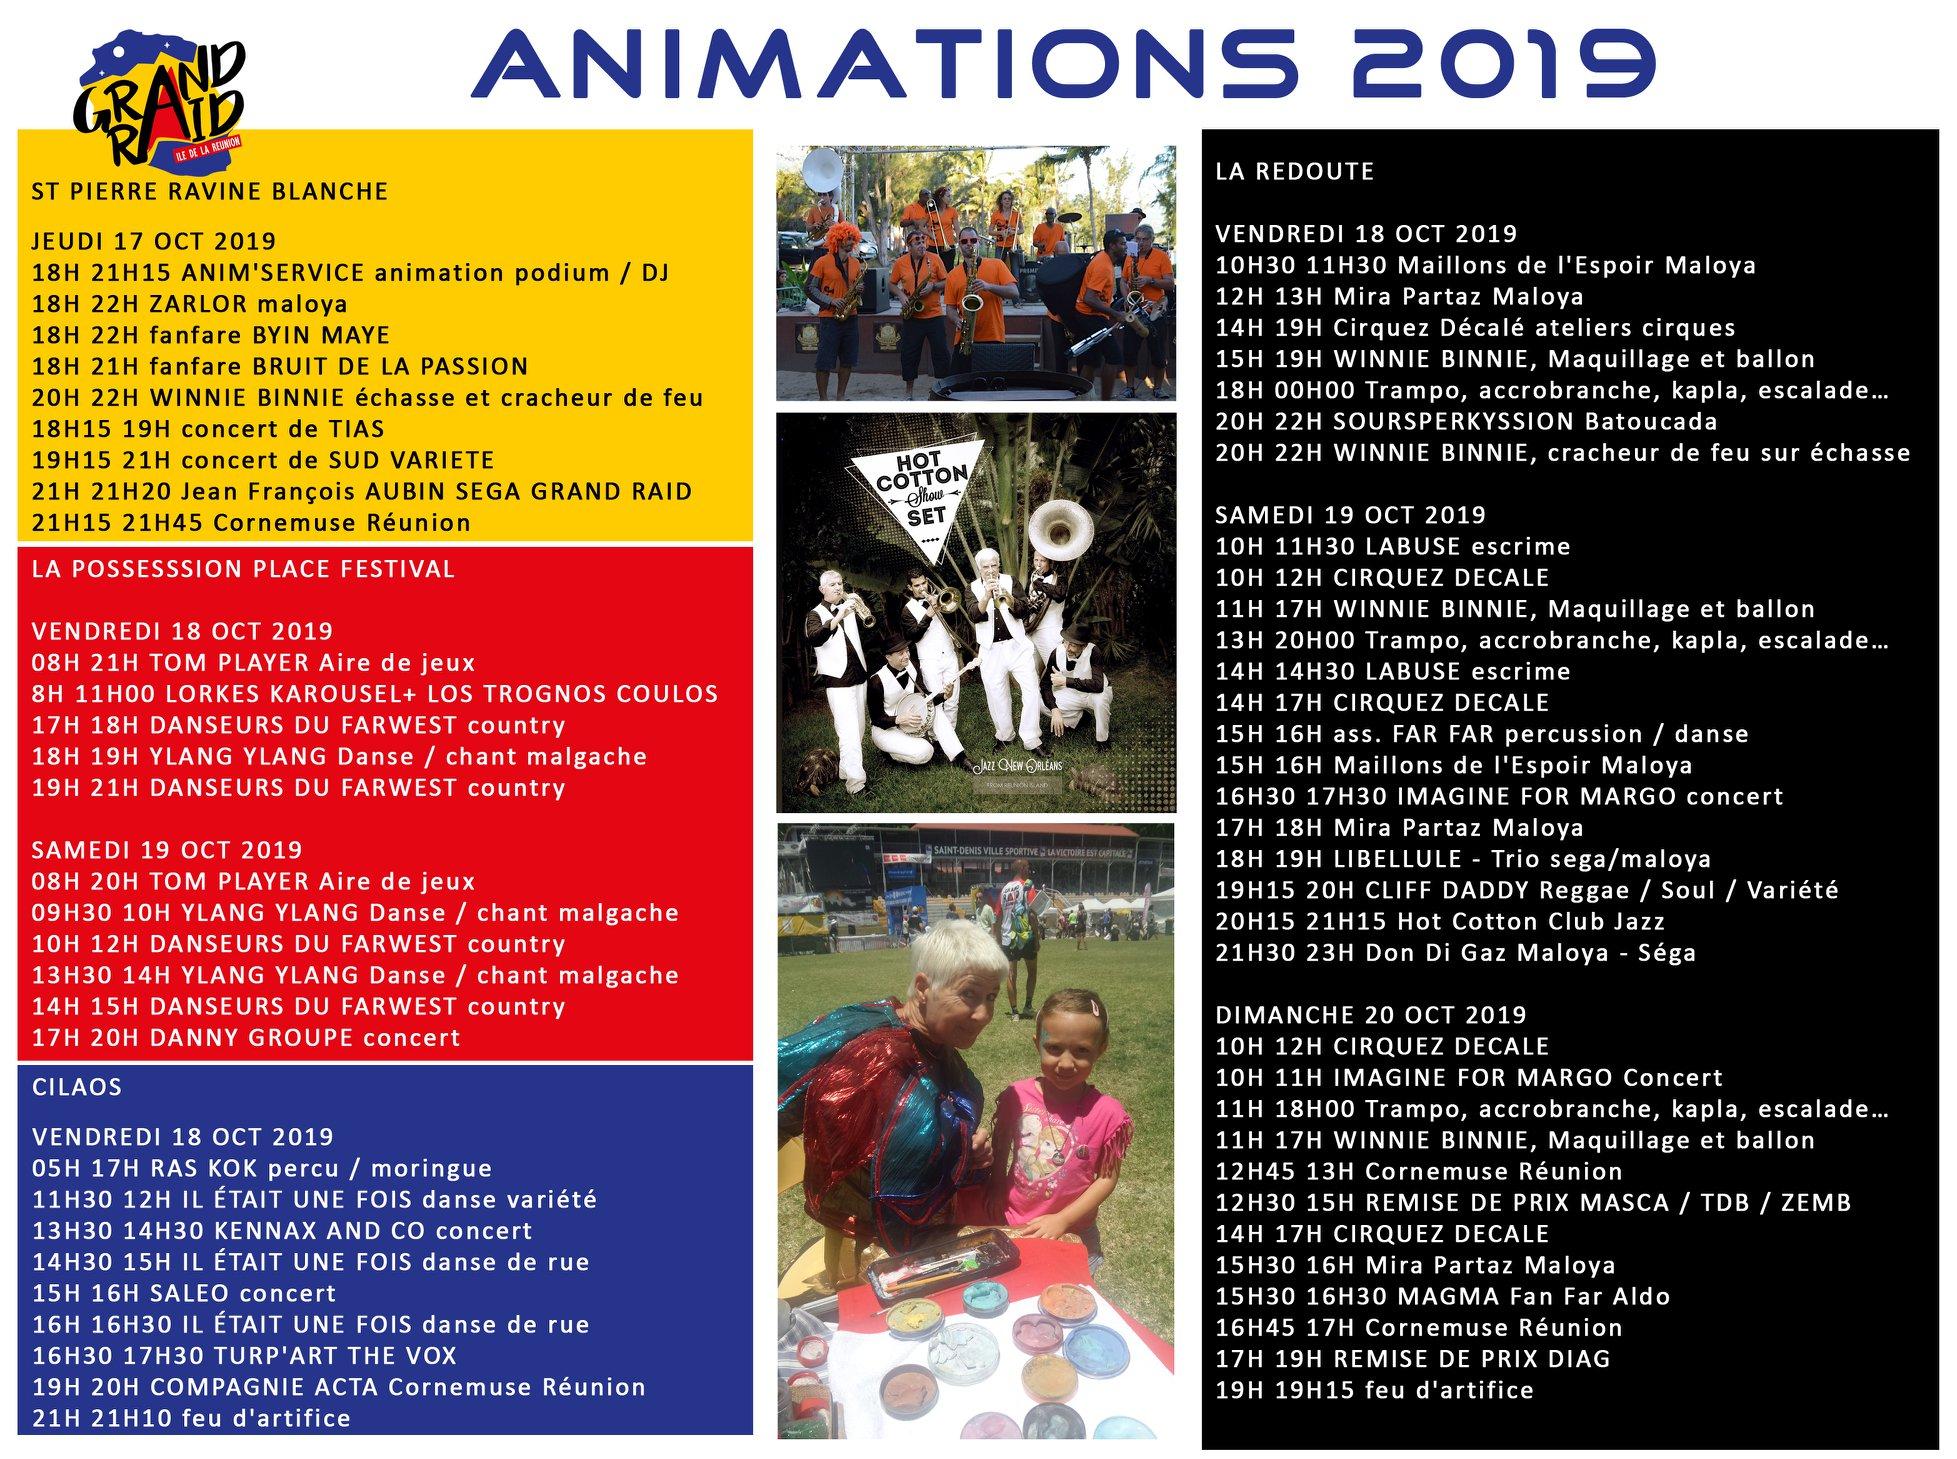 Grand-Raid-2019-Animations